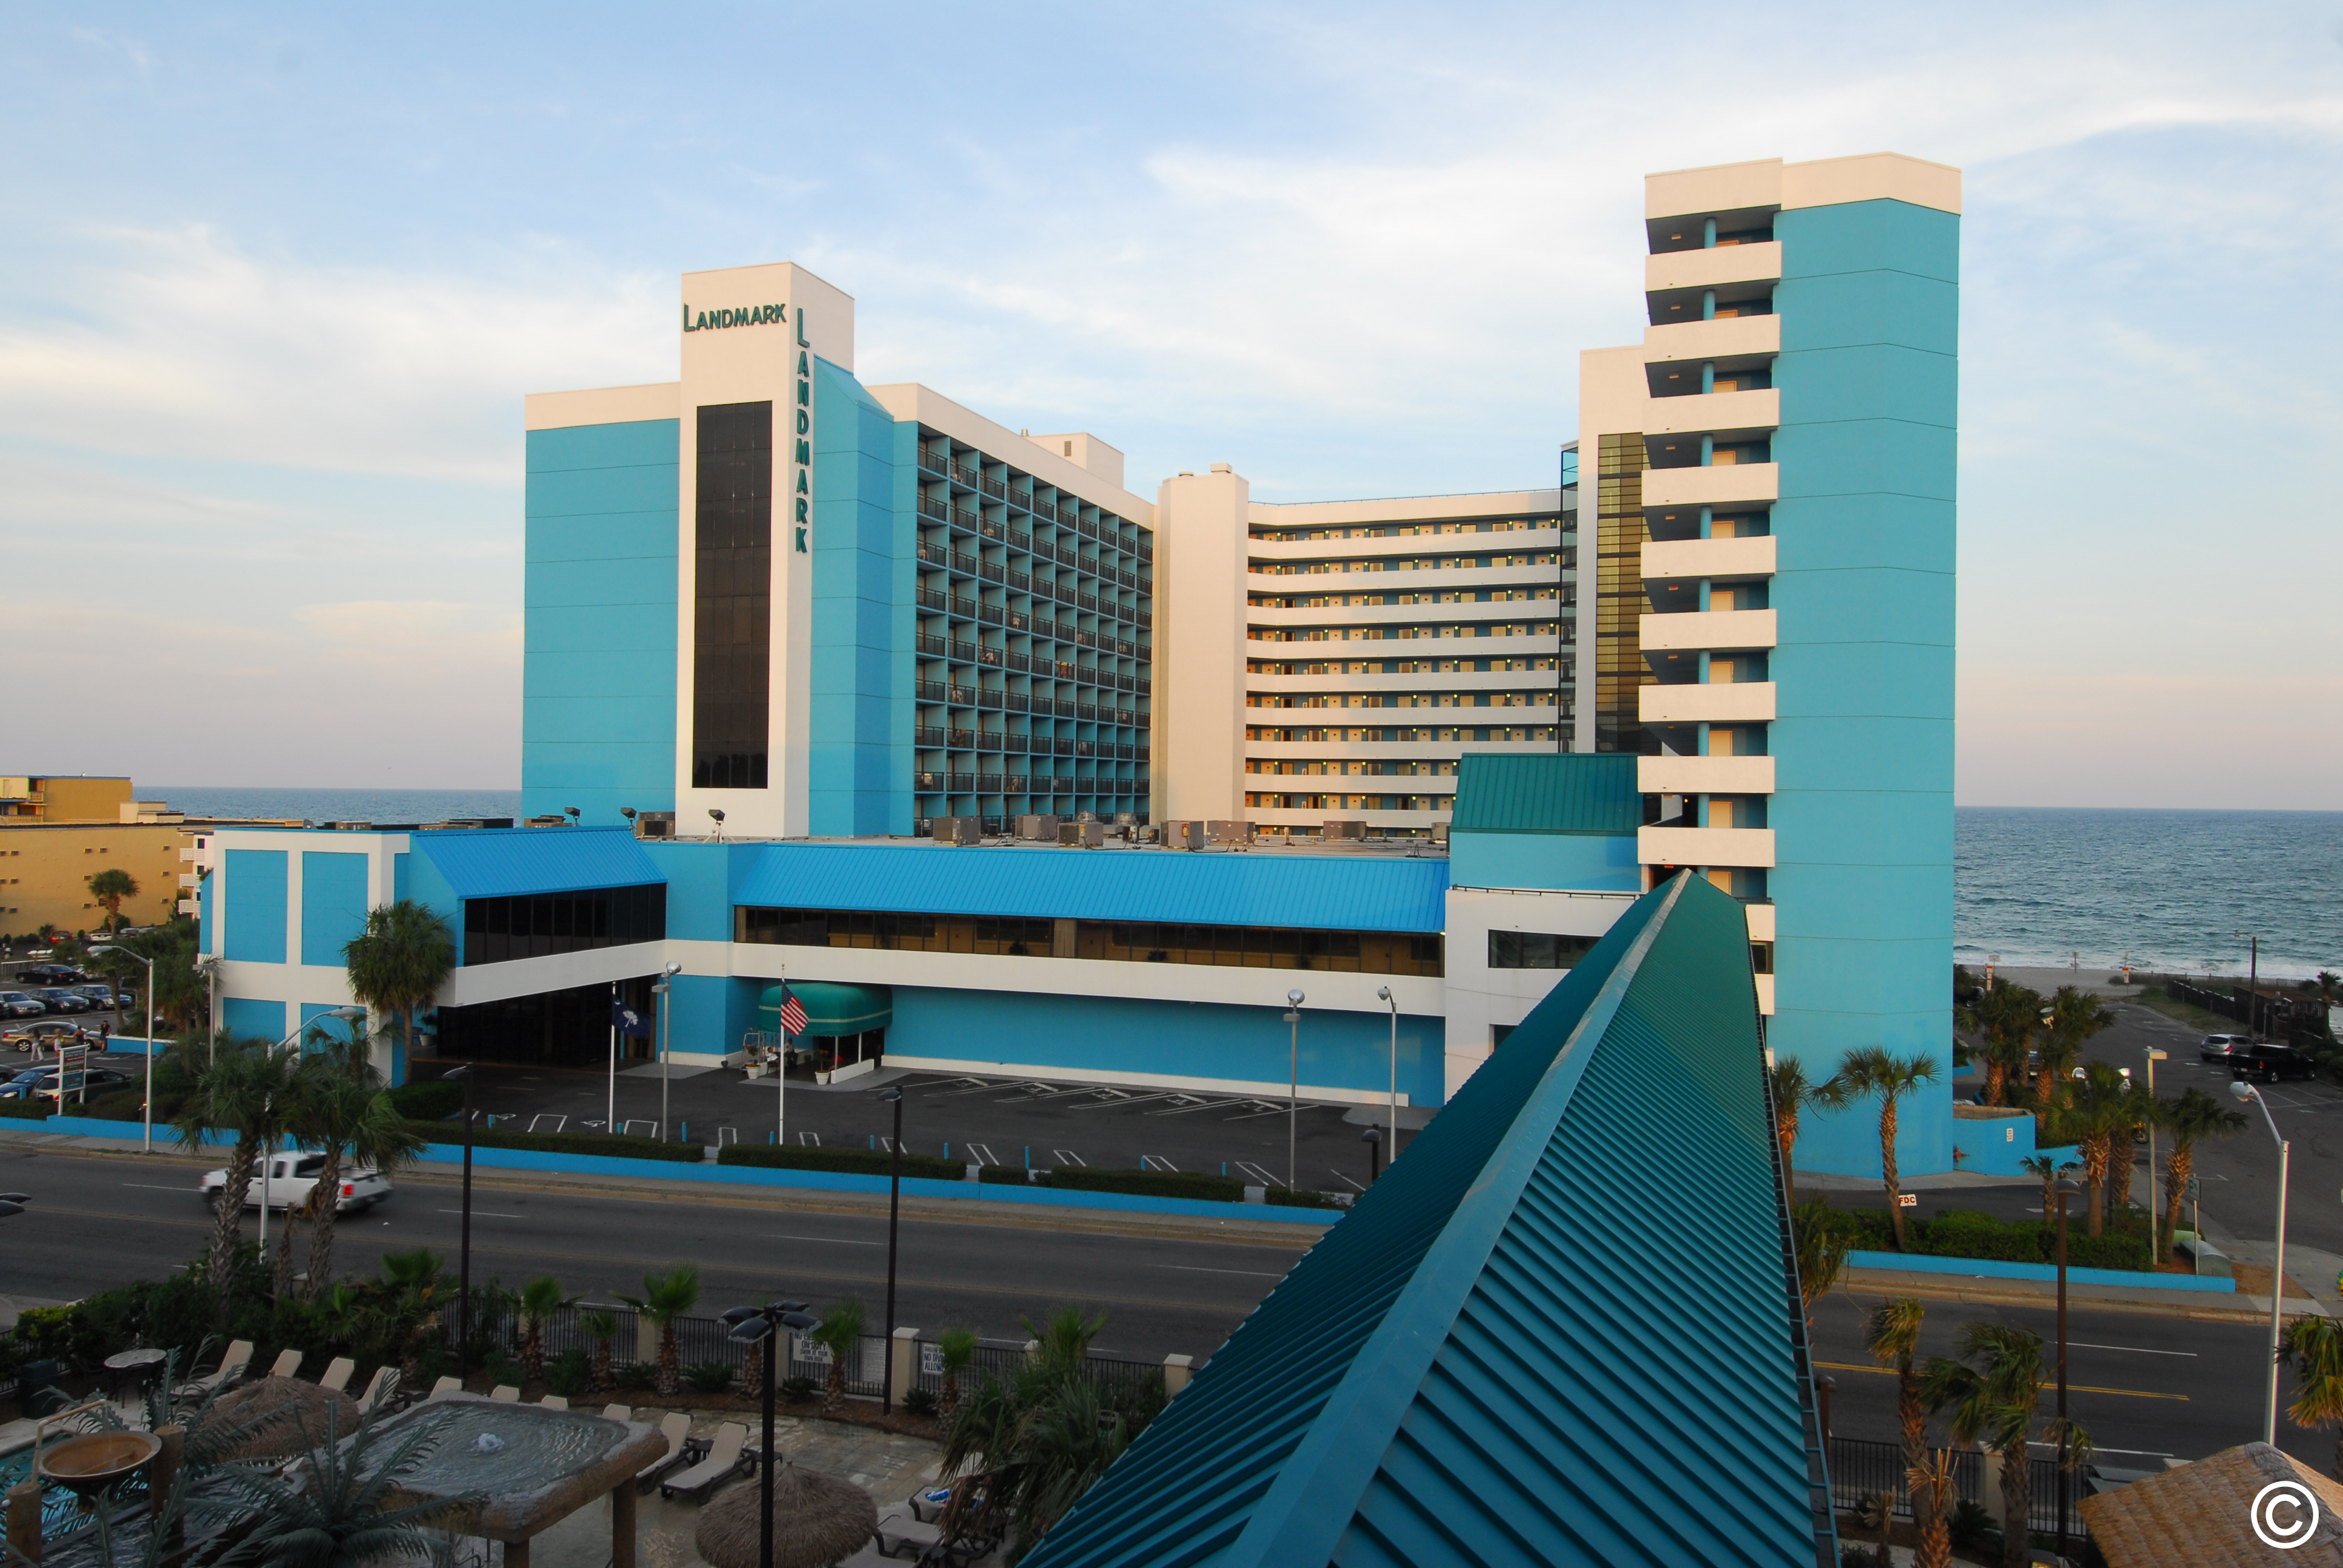 Exterior view of Landmark Resort.